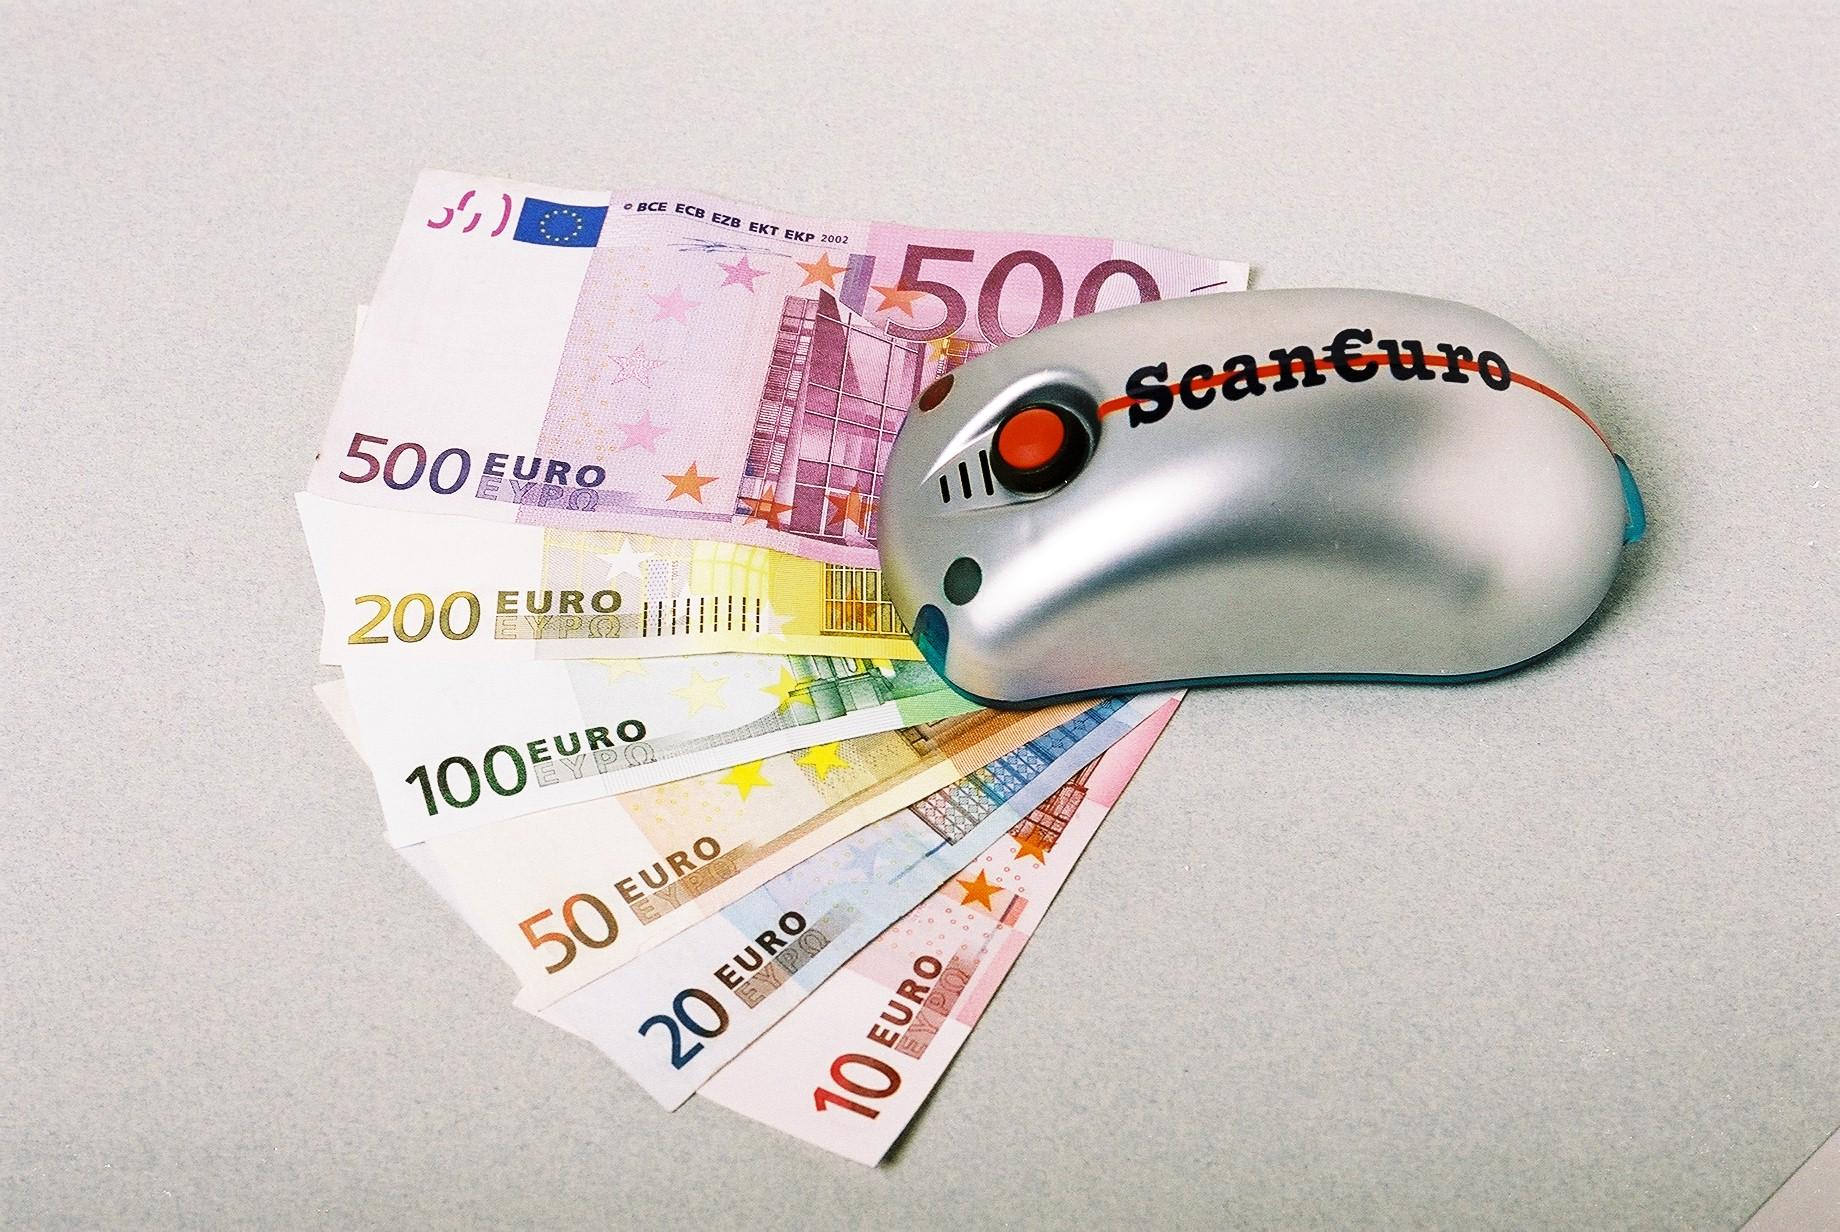 authentifier tous les Euros